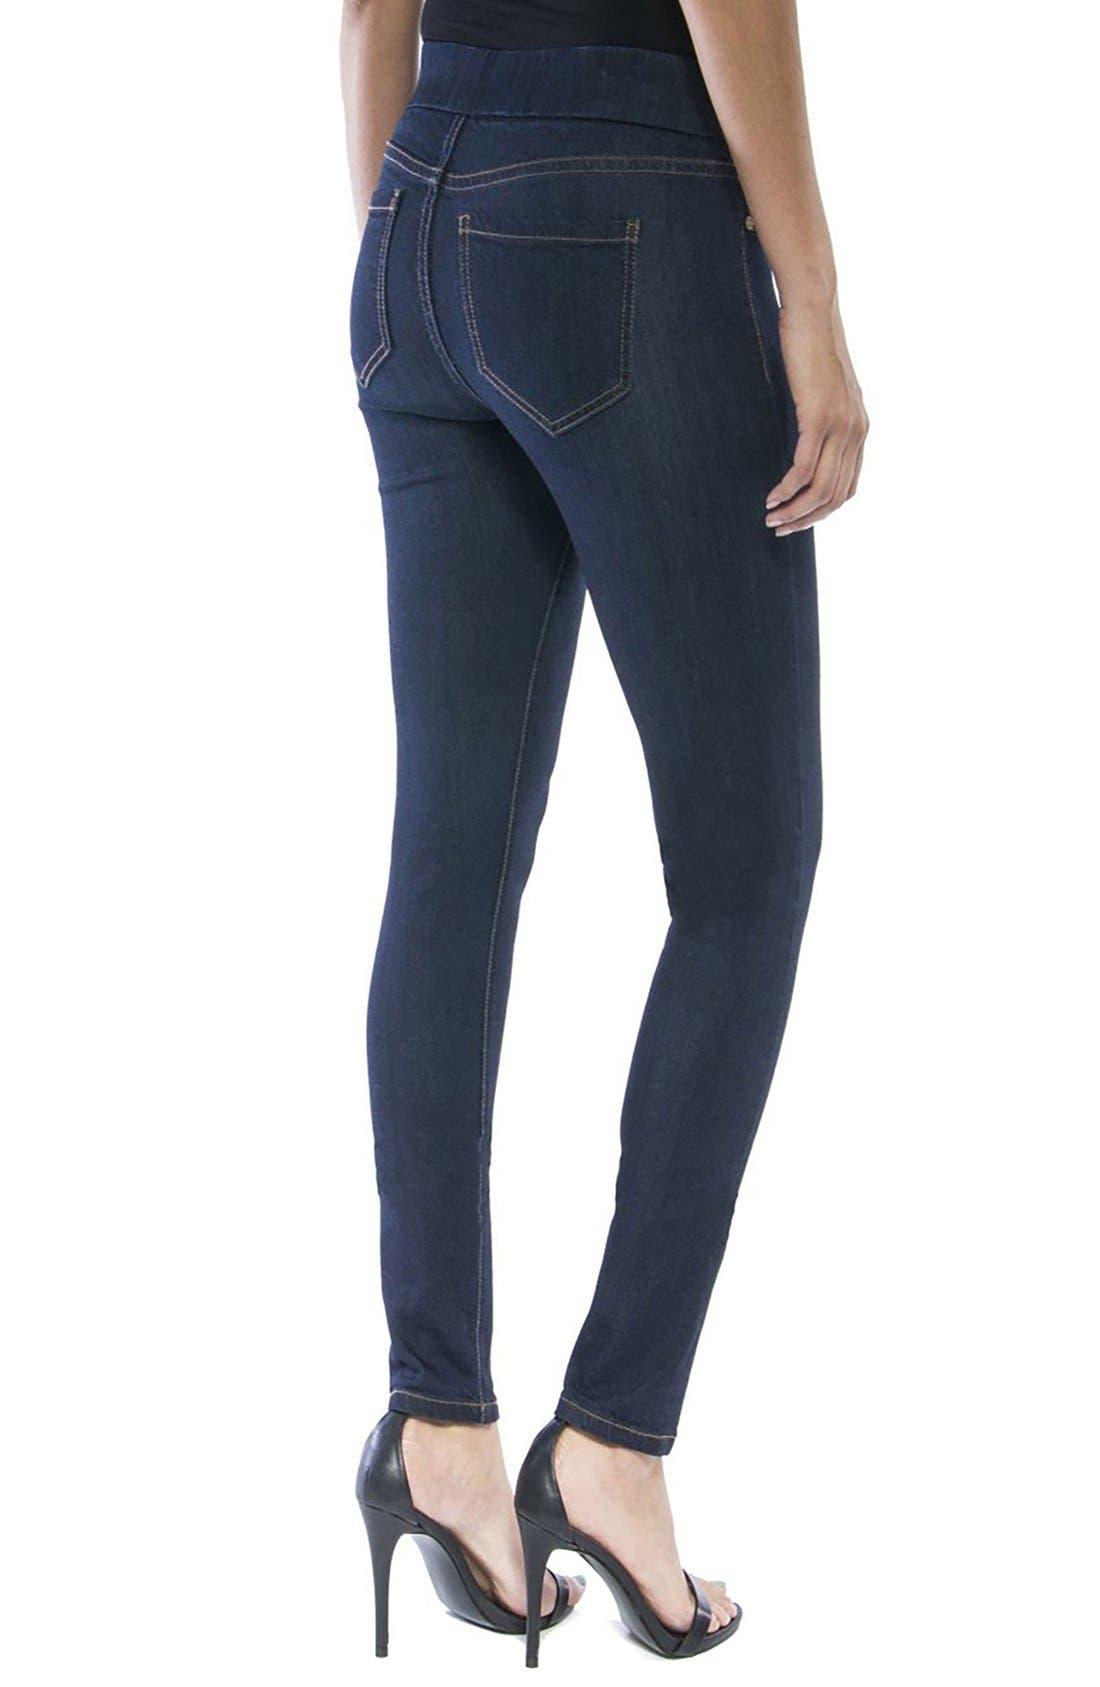 Jeans Company Sienna Mid Rise Soft Stretch Denim Leggings,                             Alternate thumbnail 2, color,                             Indigo Rinse